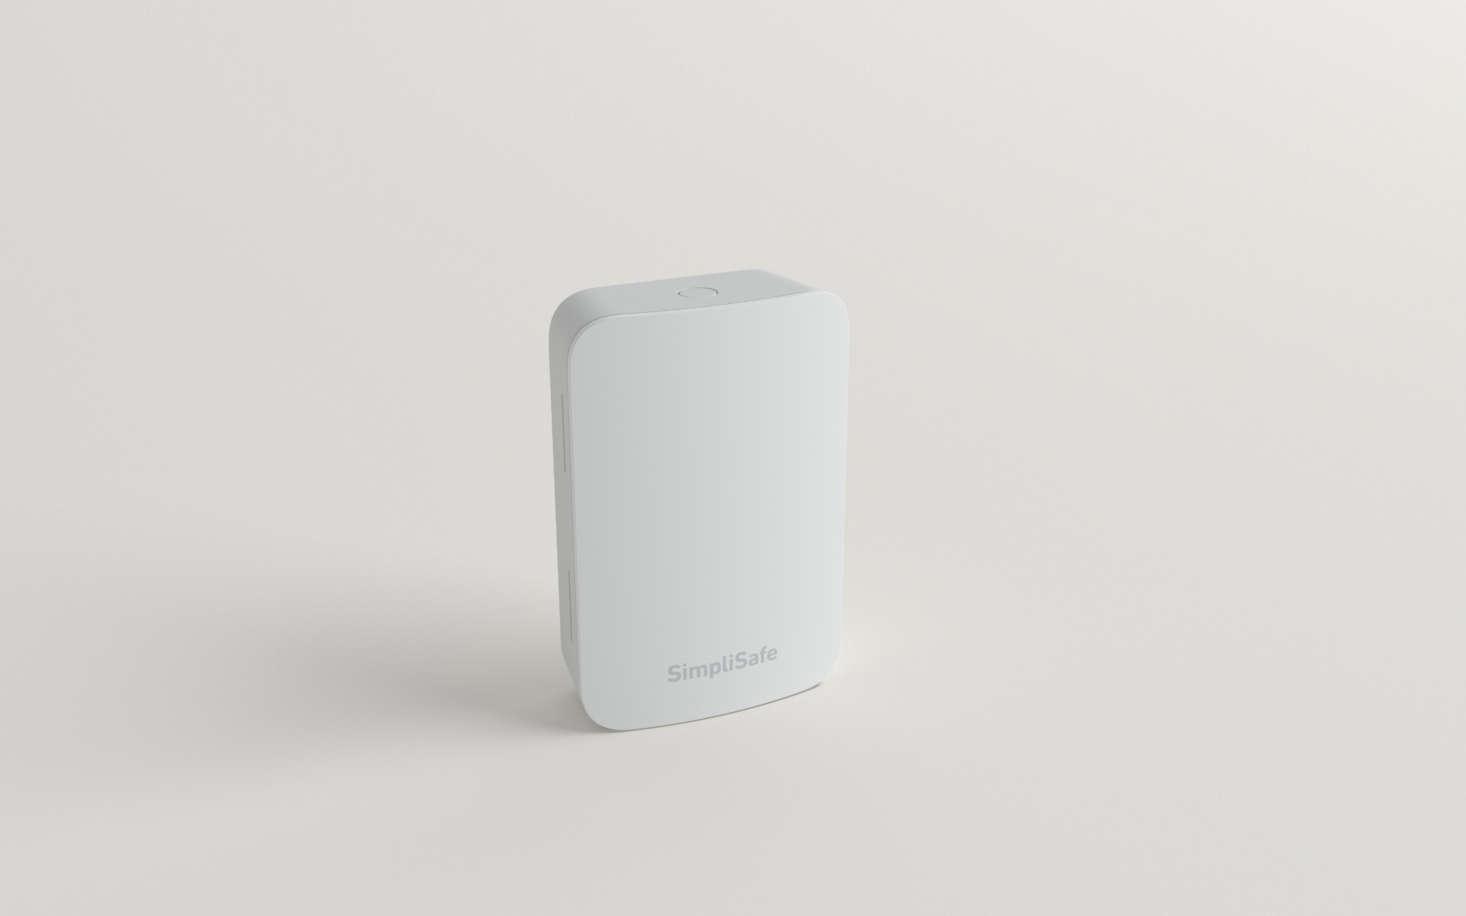 simplisafes low profile temperature sensor triggers if your home drops below 41 degrees fahrenheit - Simplisafe Home Security